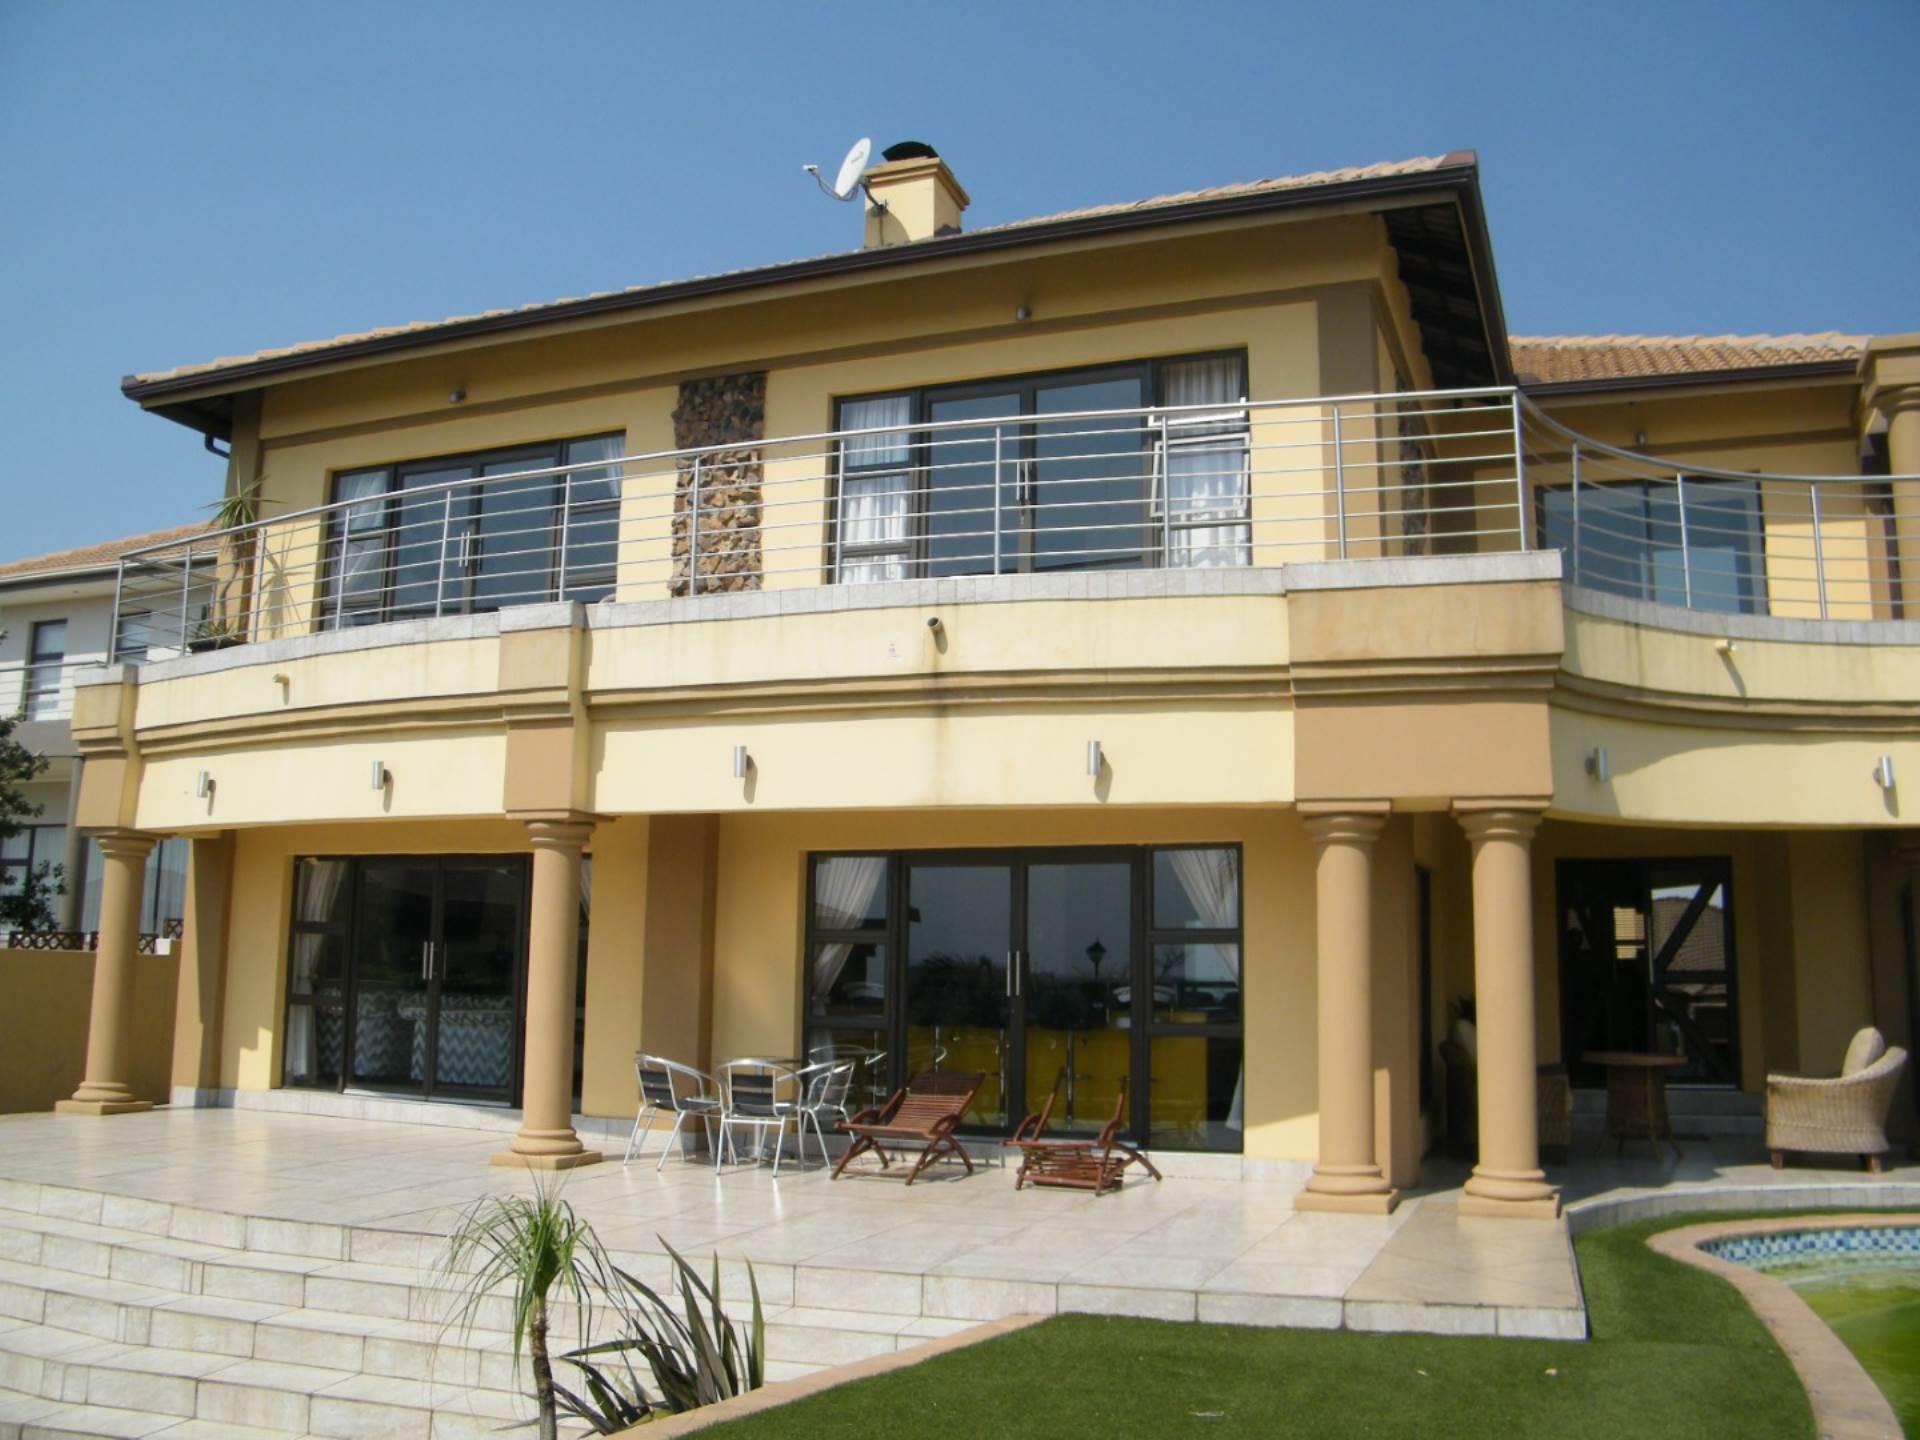 4 BedroomHouse For Sale In Bankenveld